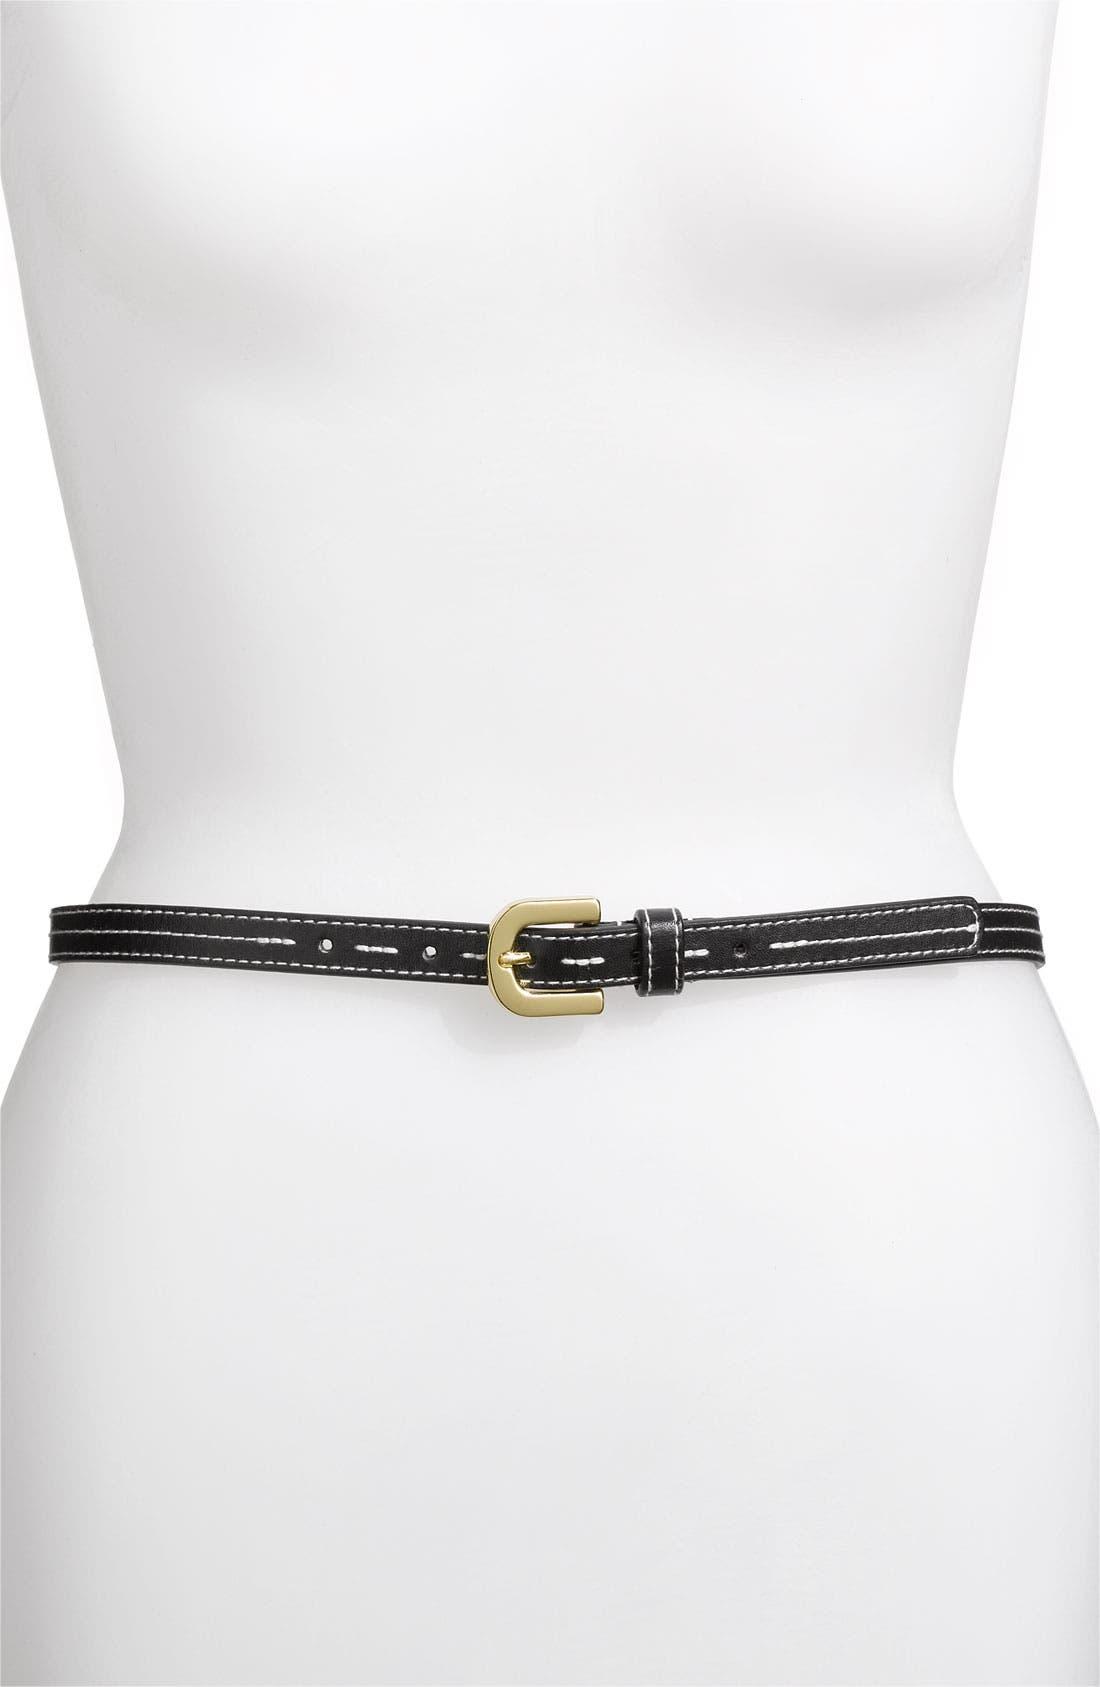 Alternate Image 1 Selected - Via Spiga 'Natural Stitch' Skinny Belt